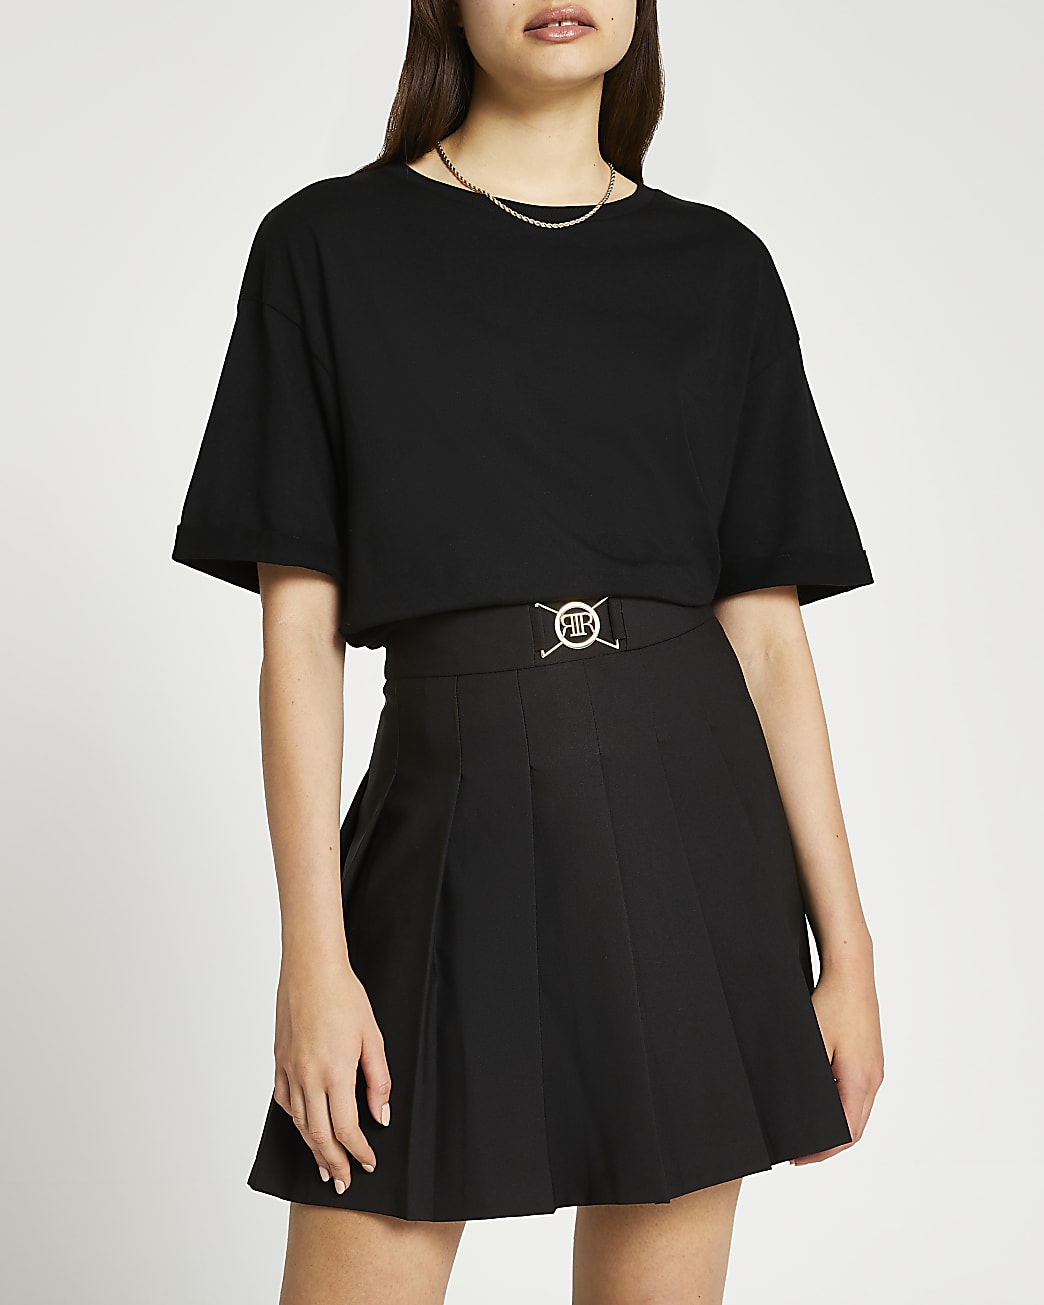 Black tennis mini skirt